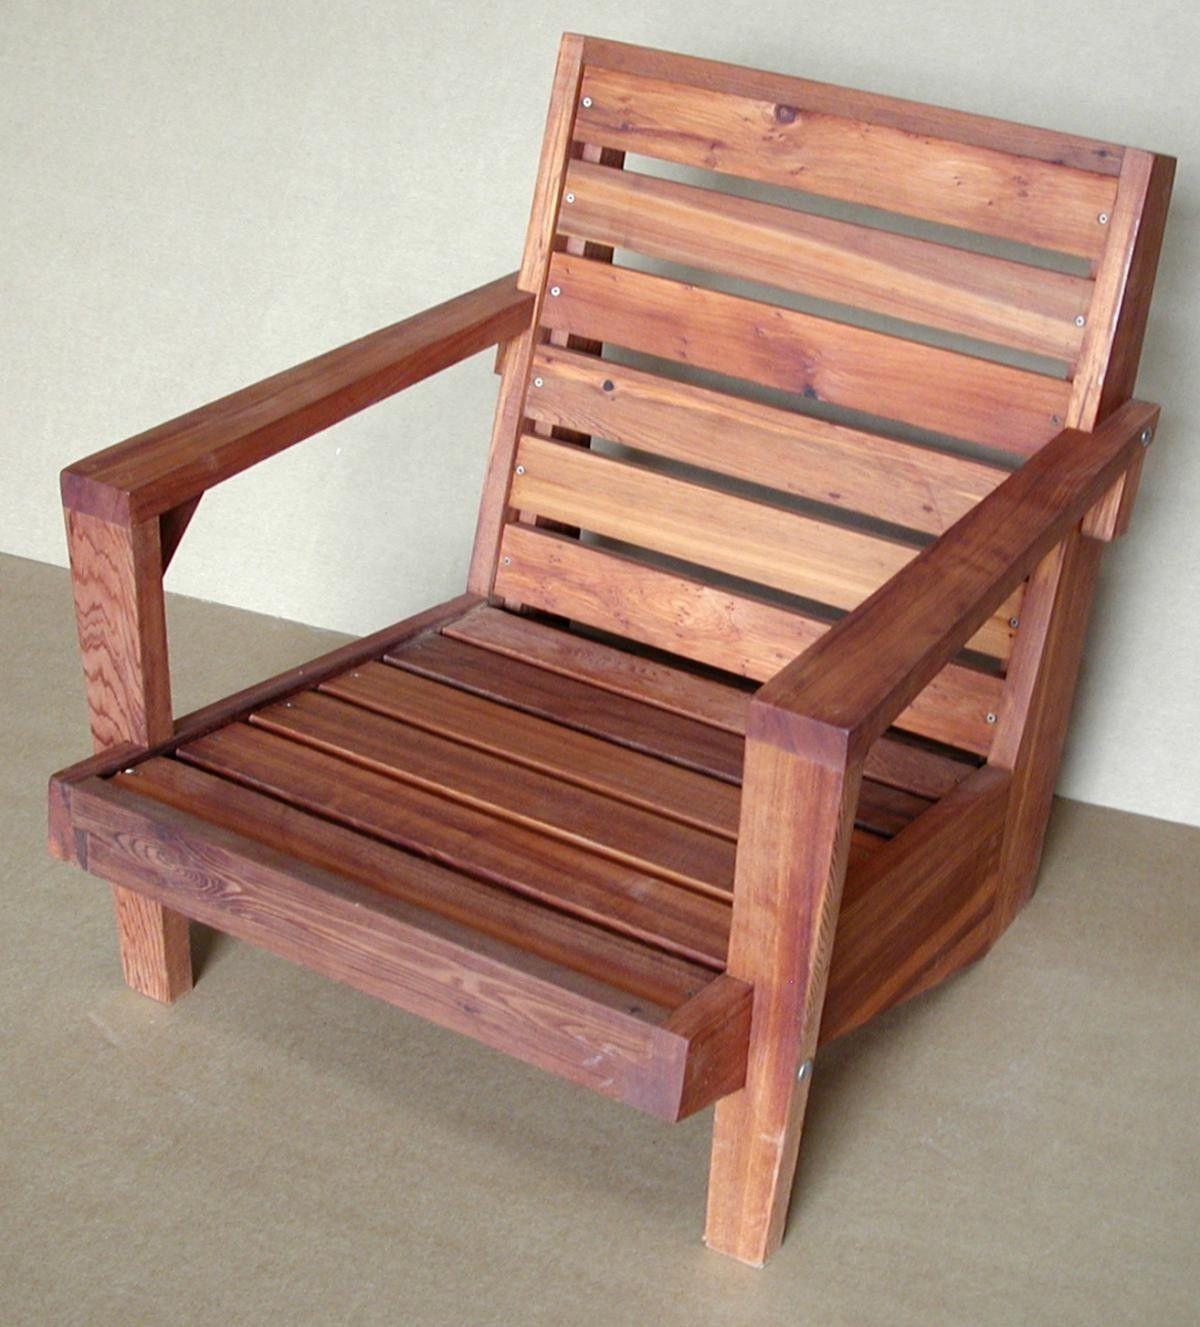 Kari S Armchair Options Redwood No Cushion Transparent Premium